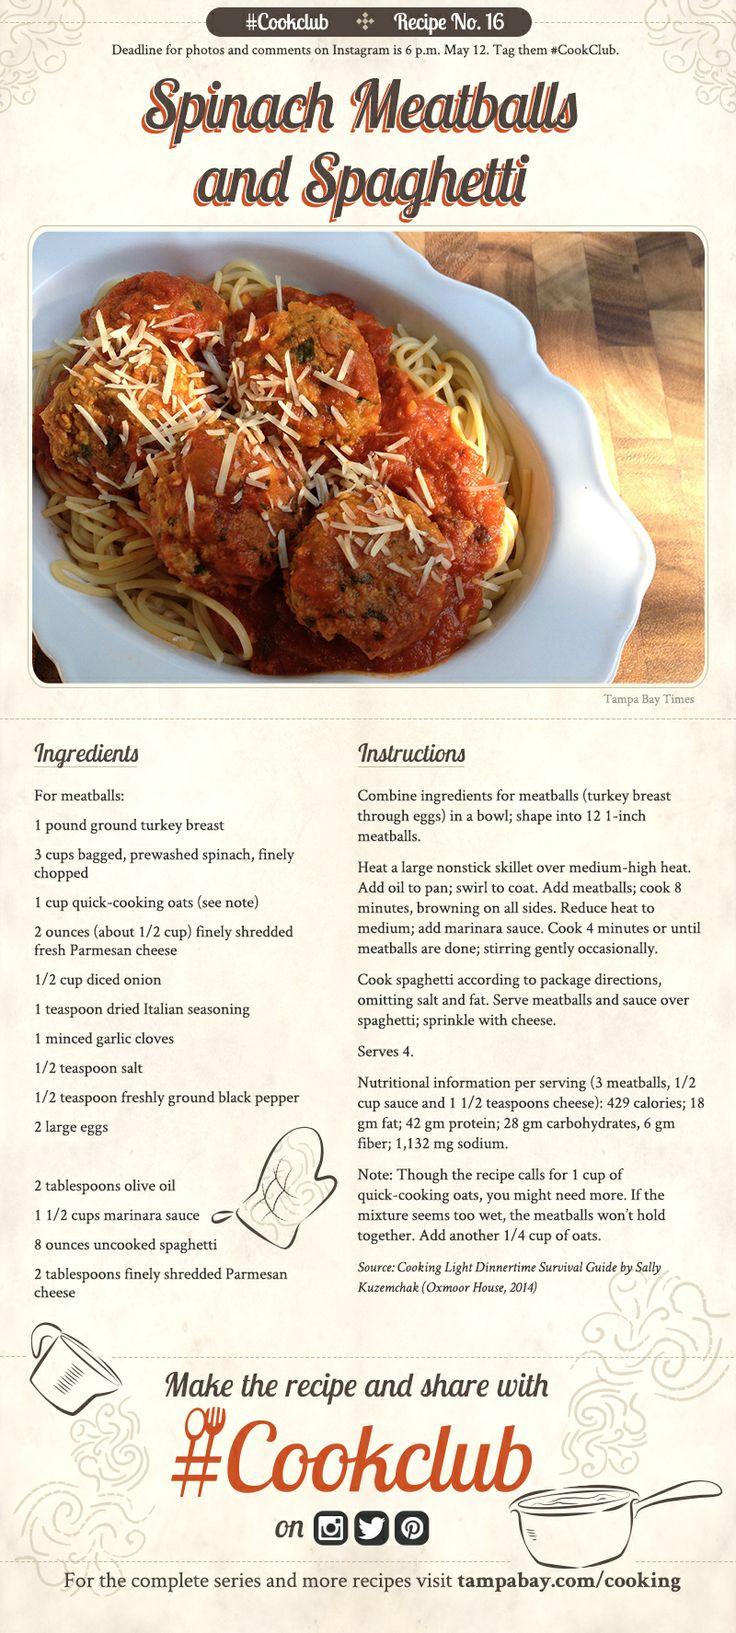 #CookClub Recipe No. 16 is a classic!